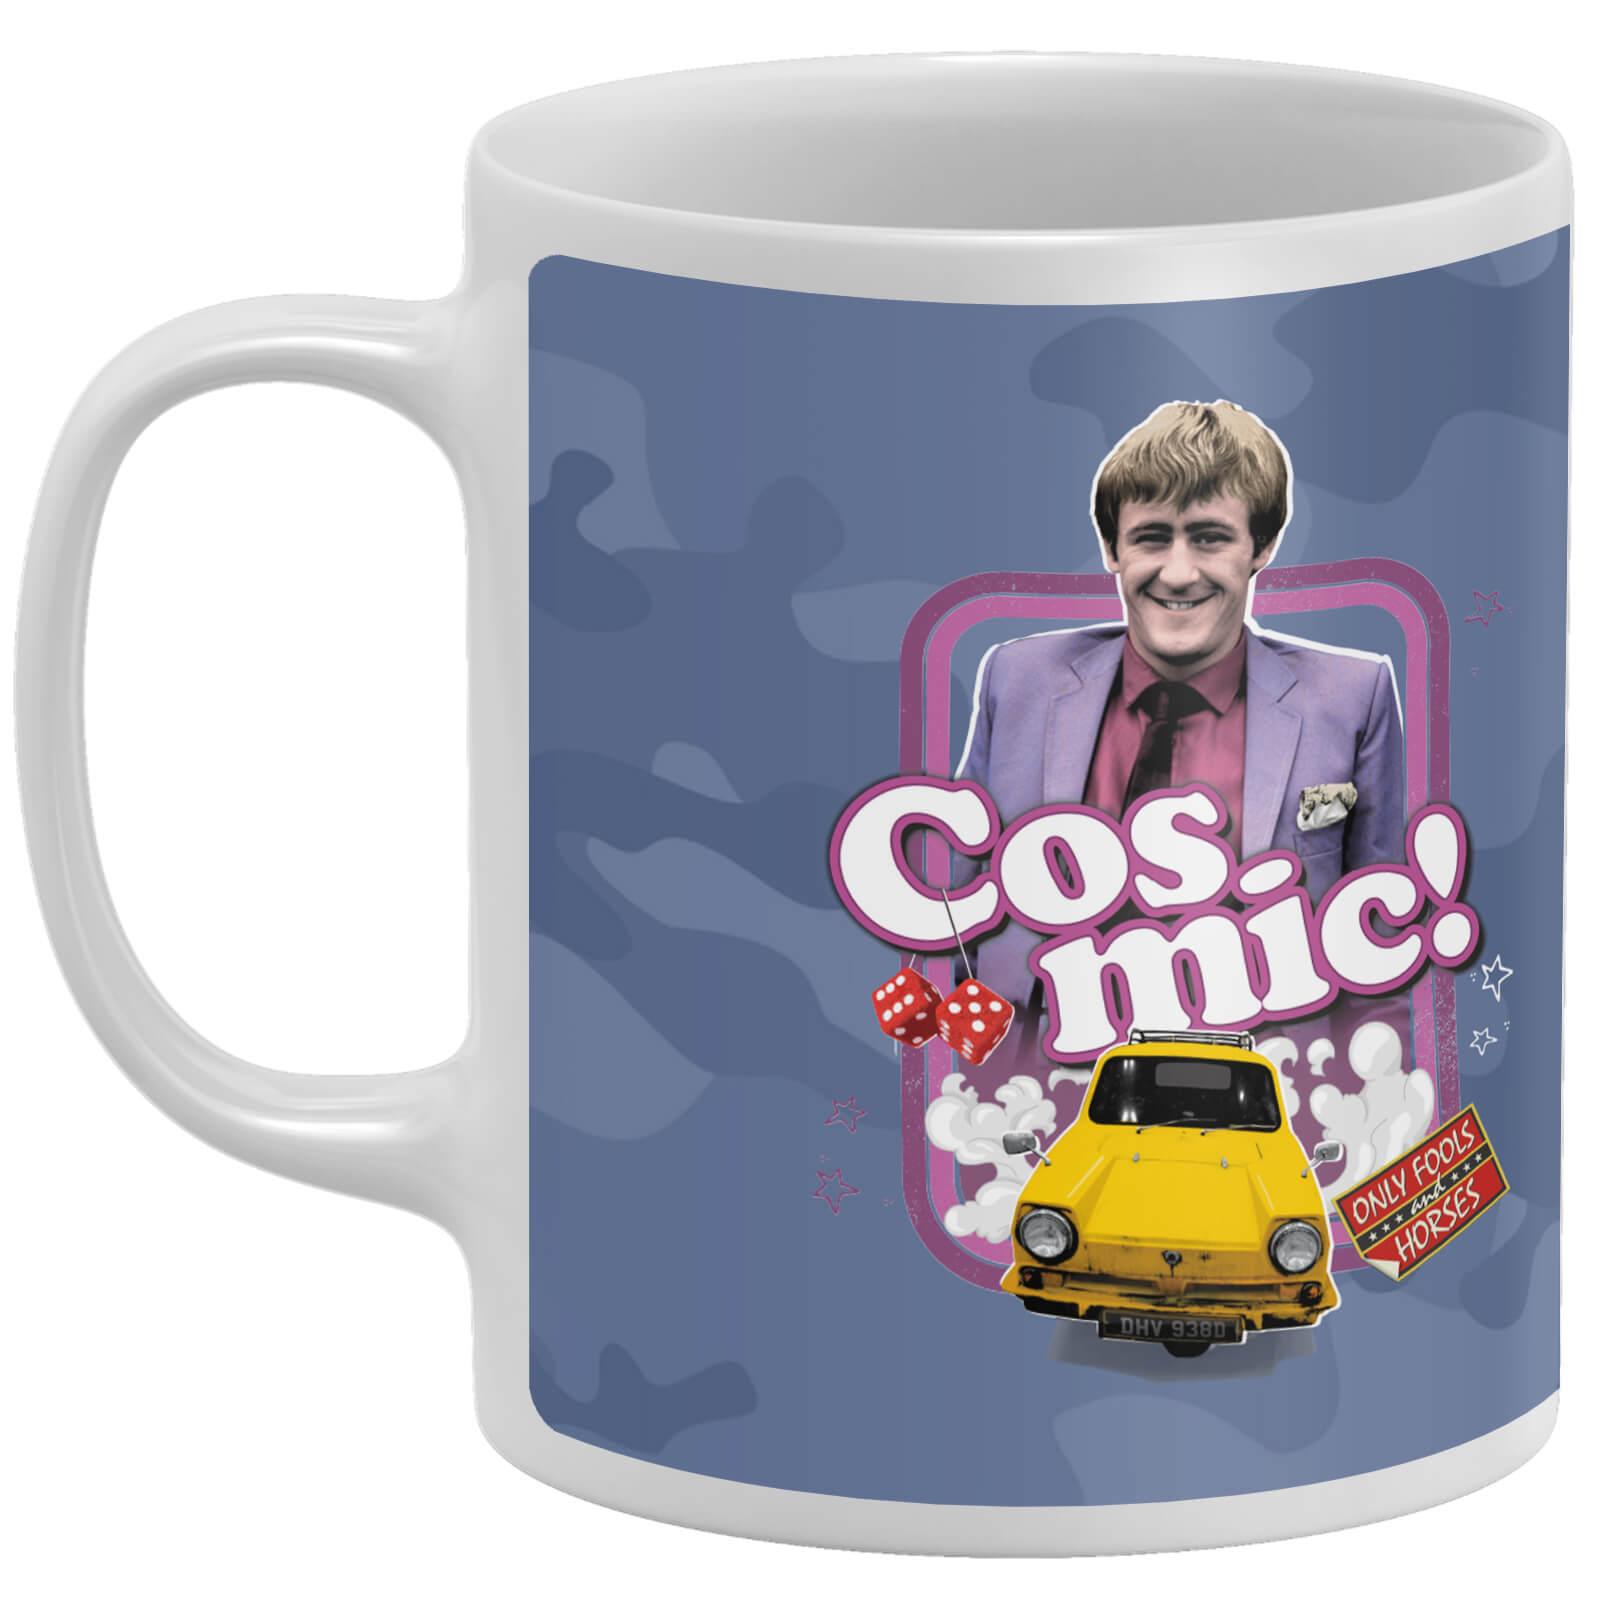 Only Fools And Horses Cos mic! Mug